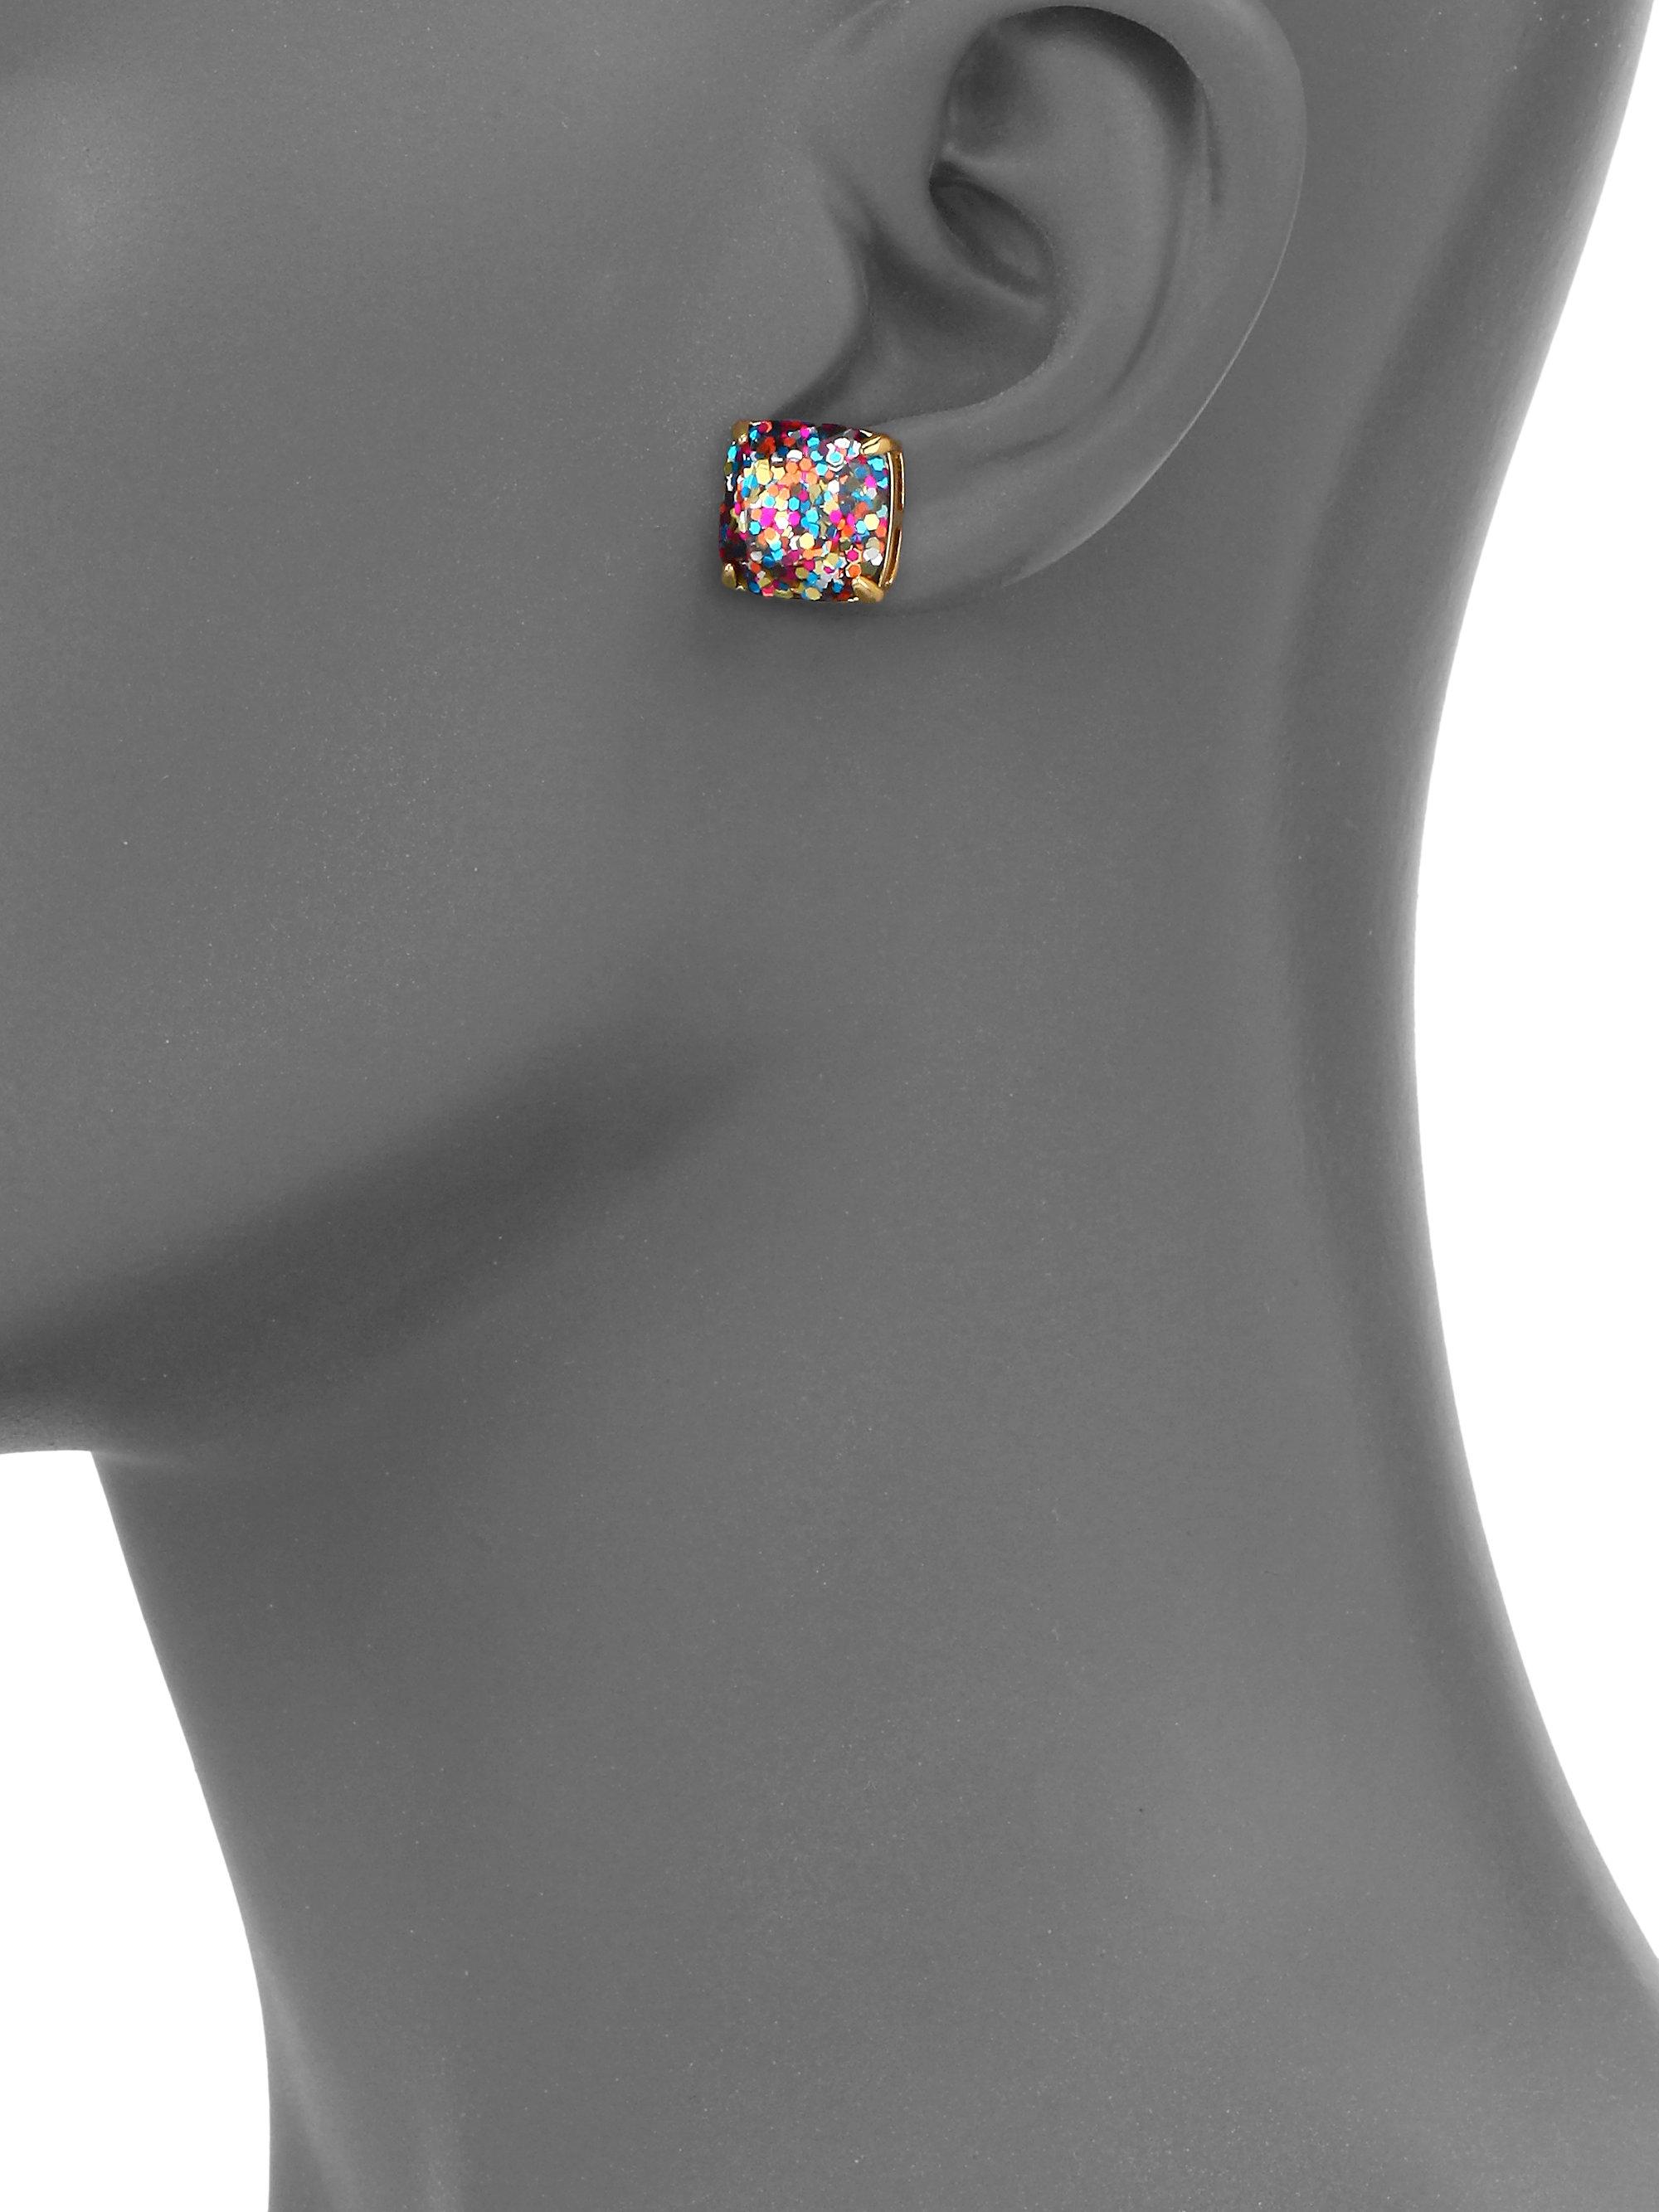 e22aea99e Kate Spade Glitter Square Stud Earrings/Multicolor in Metallic - Lyst